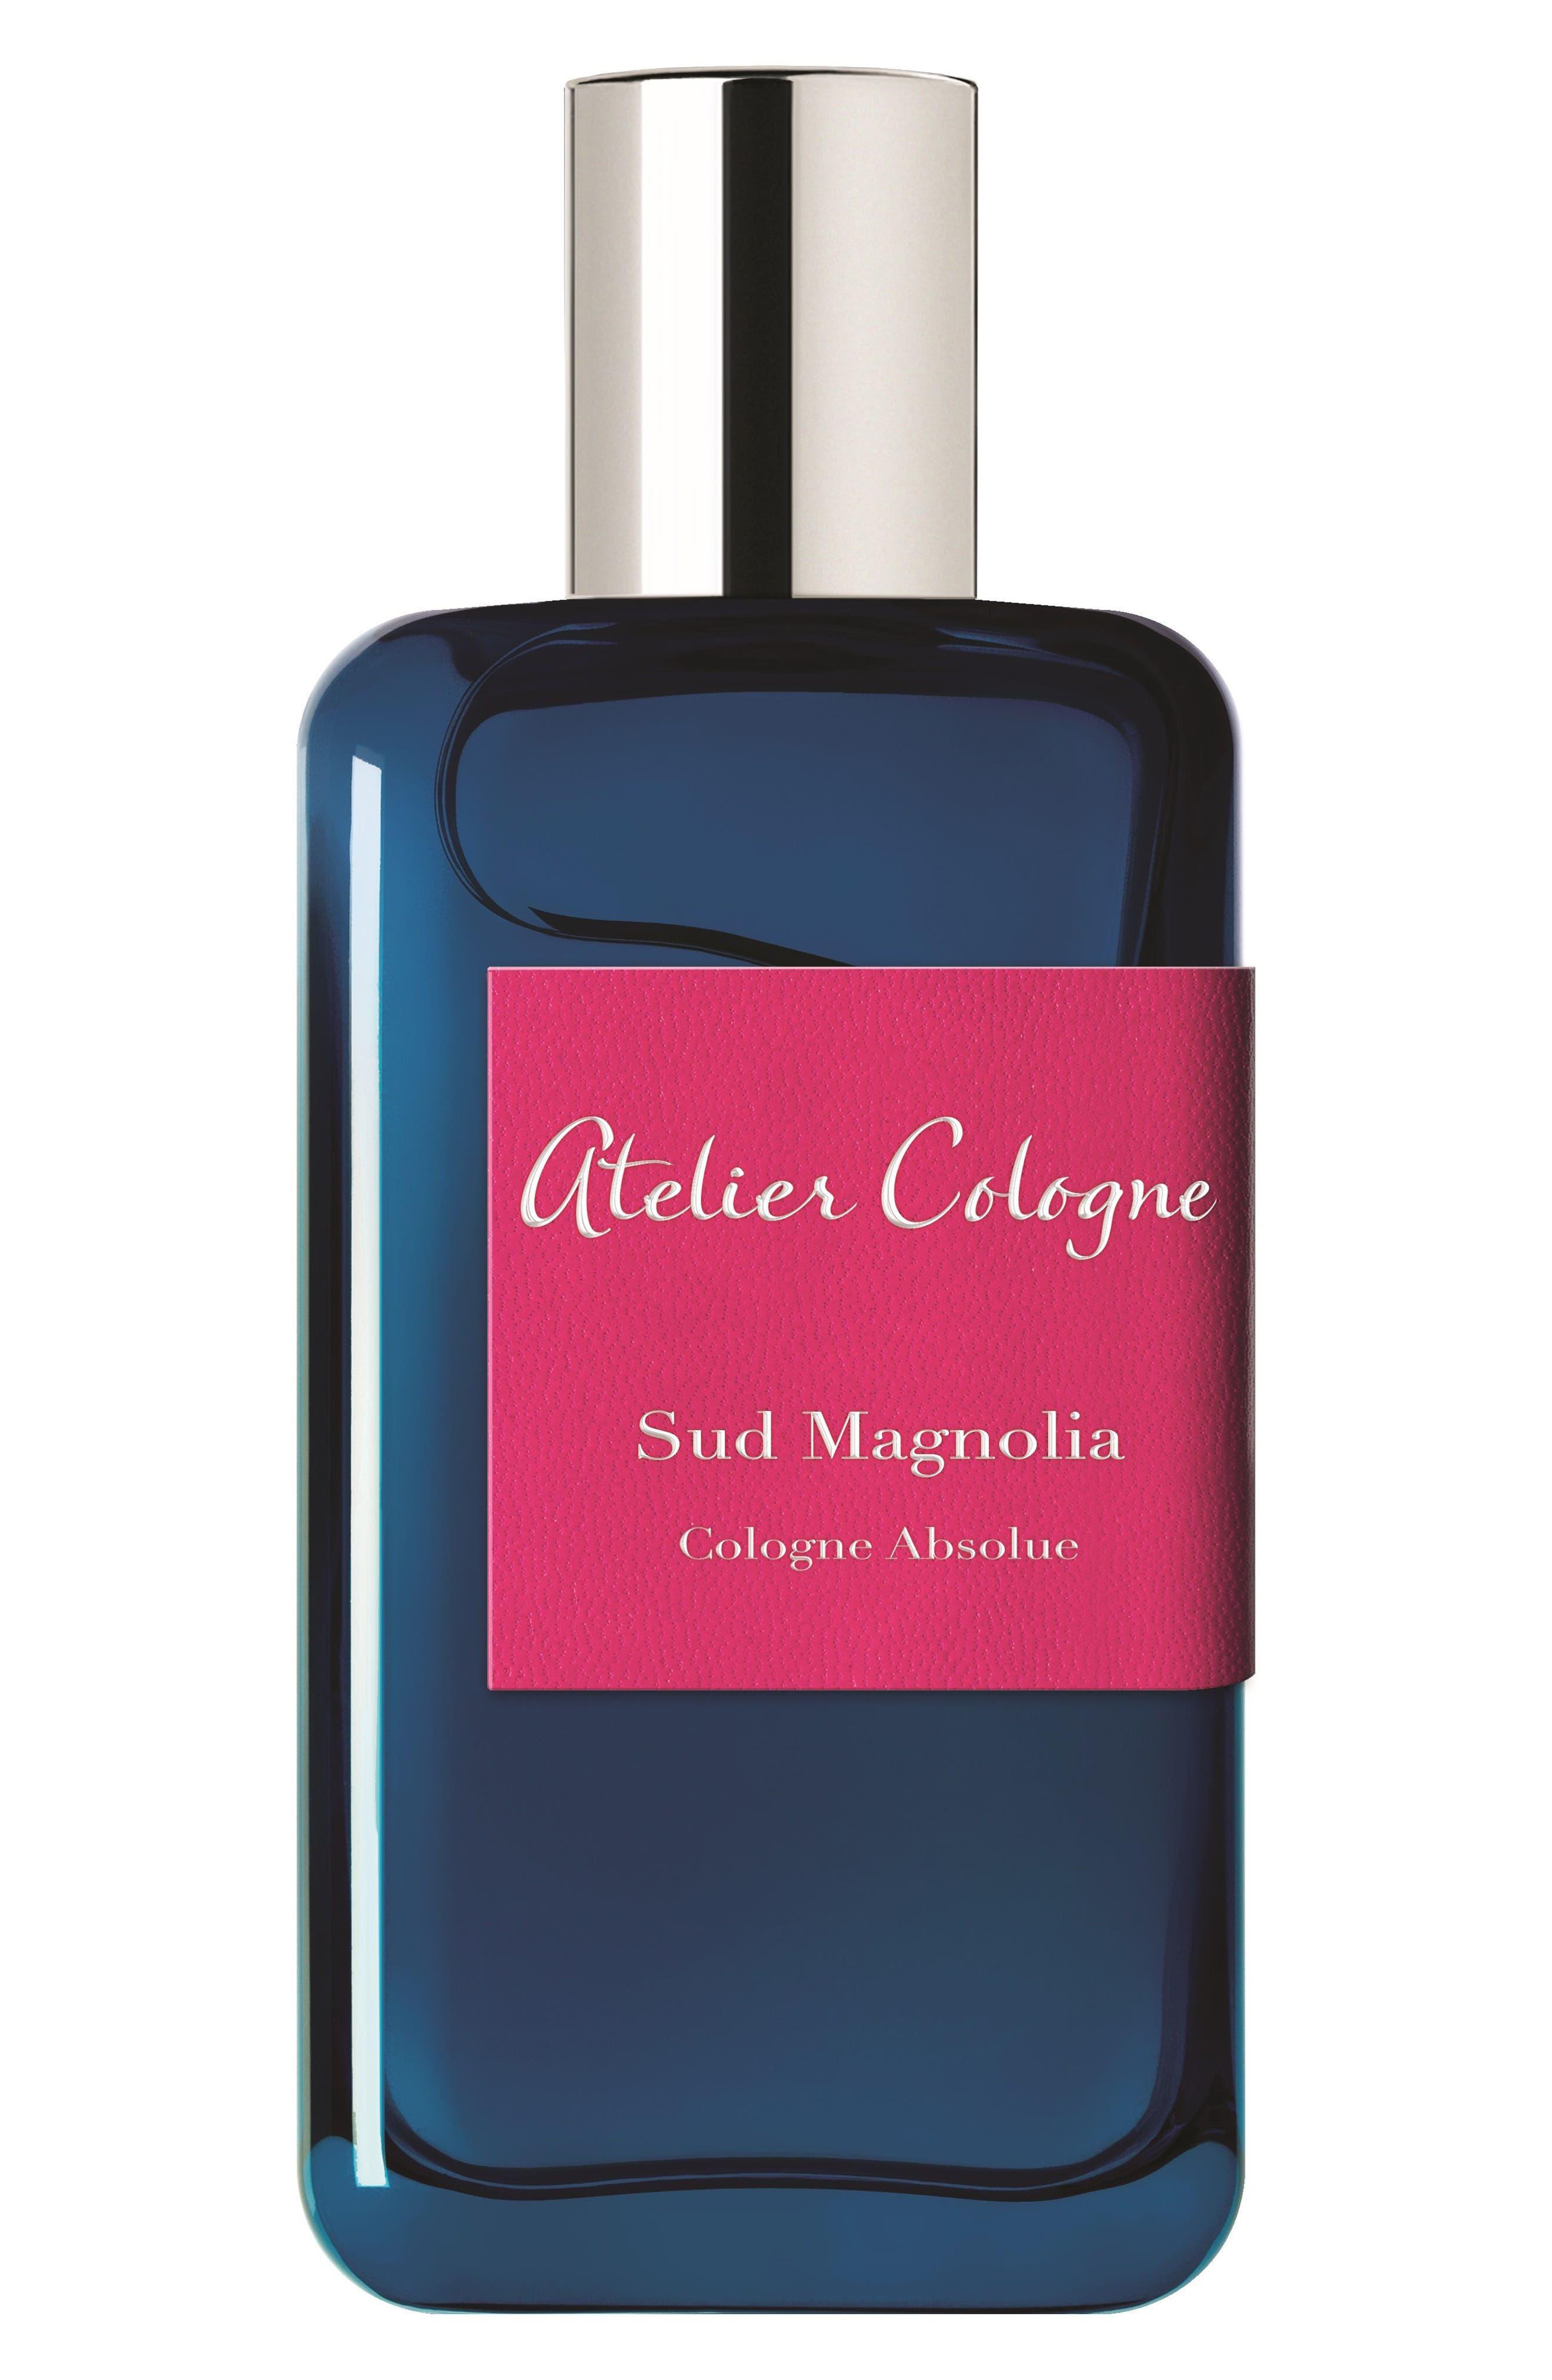 Atelier Cologne Sud Magnolia Cologne Absolue